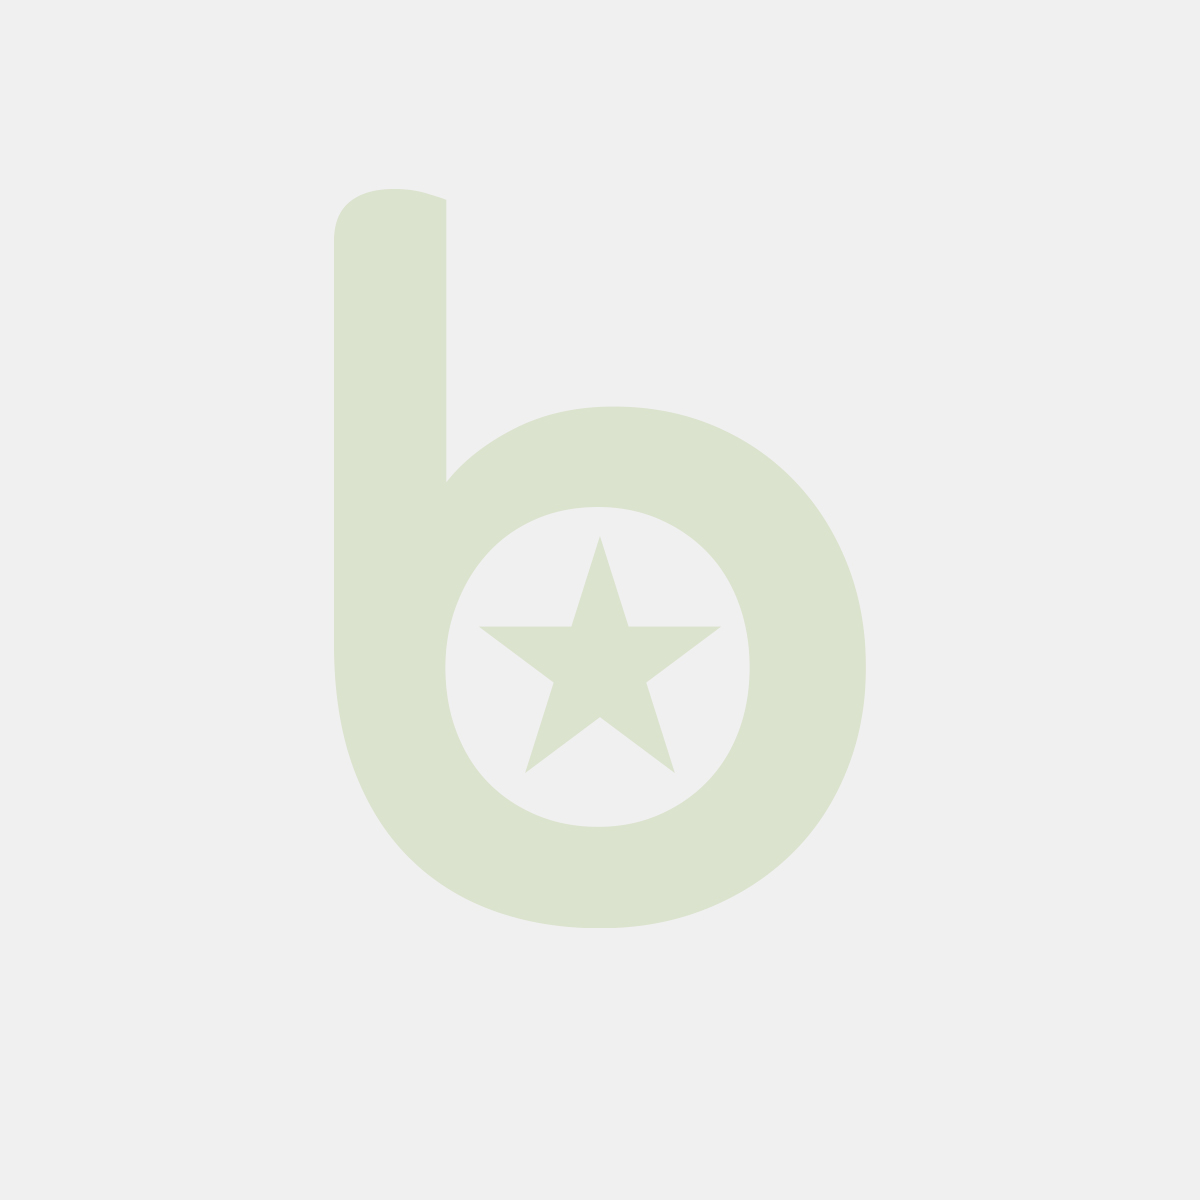 FINGERFOOD - BIO talerzyk SHELLY MINI S PLA, transparenty 11,5x7cm op. 50 sztuk